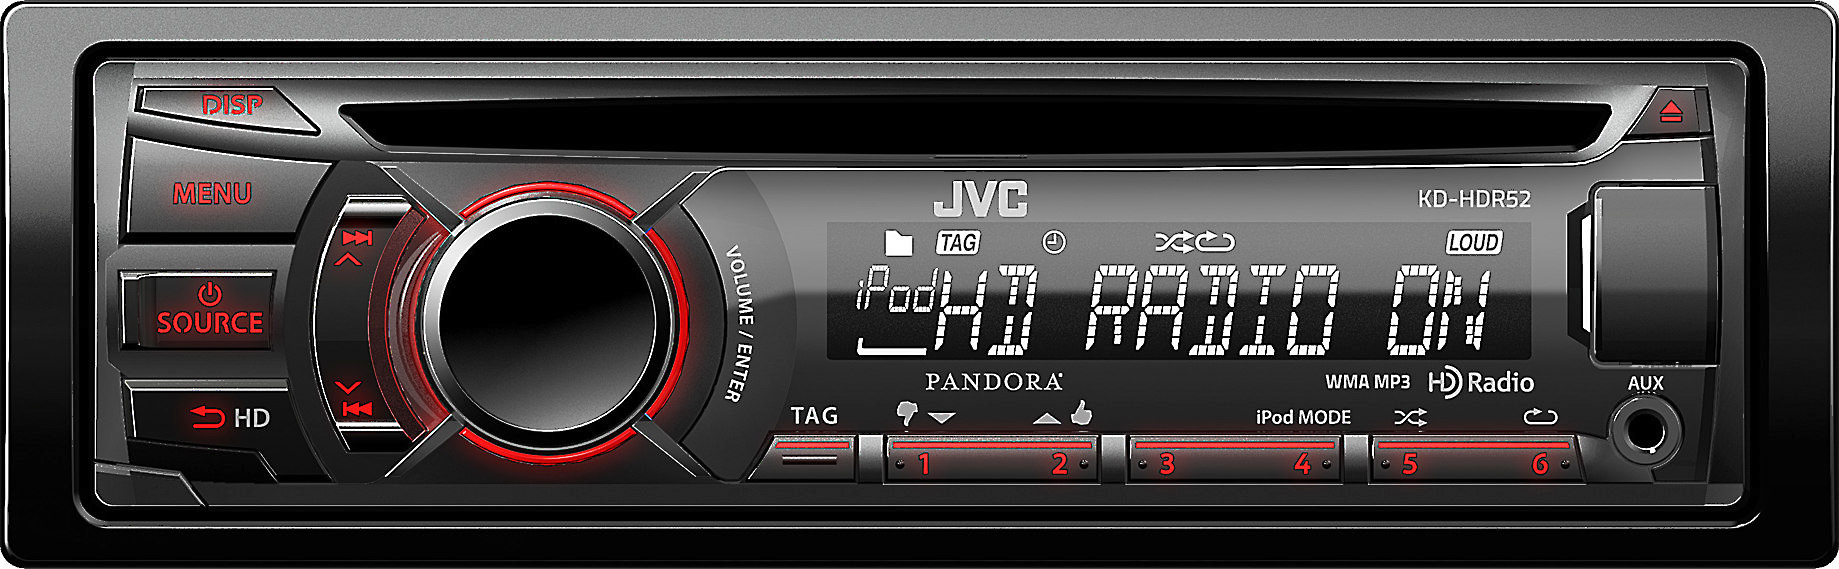 JVC KD-HDR52 CD receiver at Crutchfield on